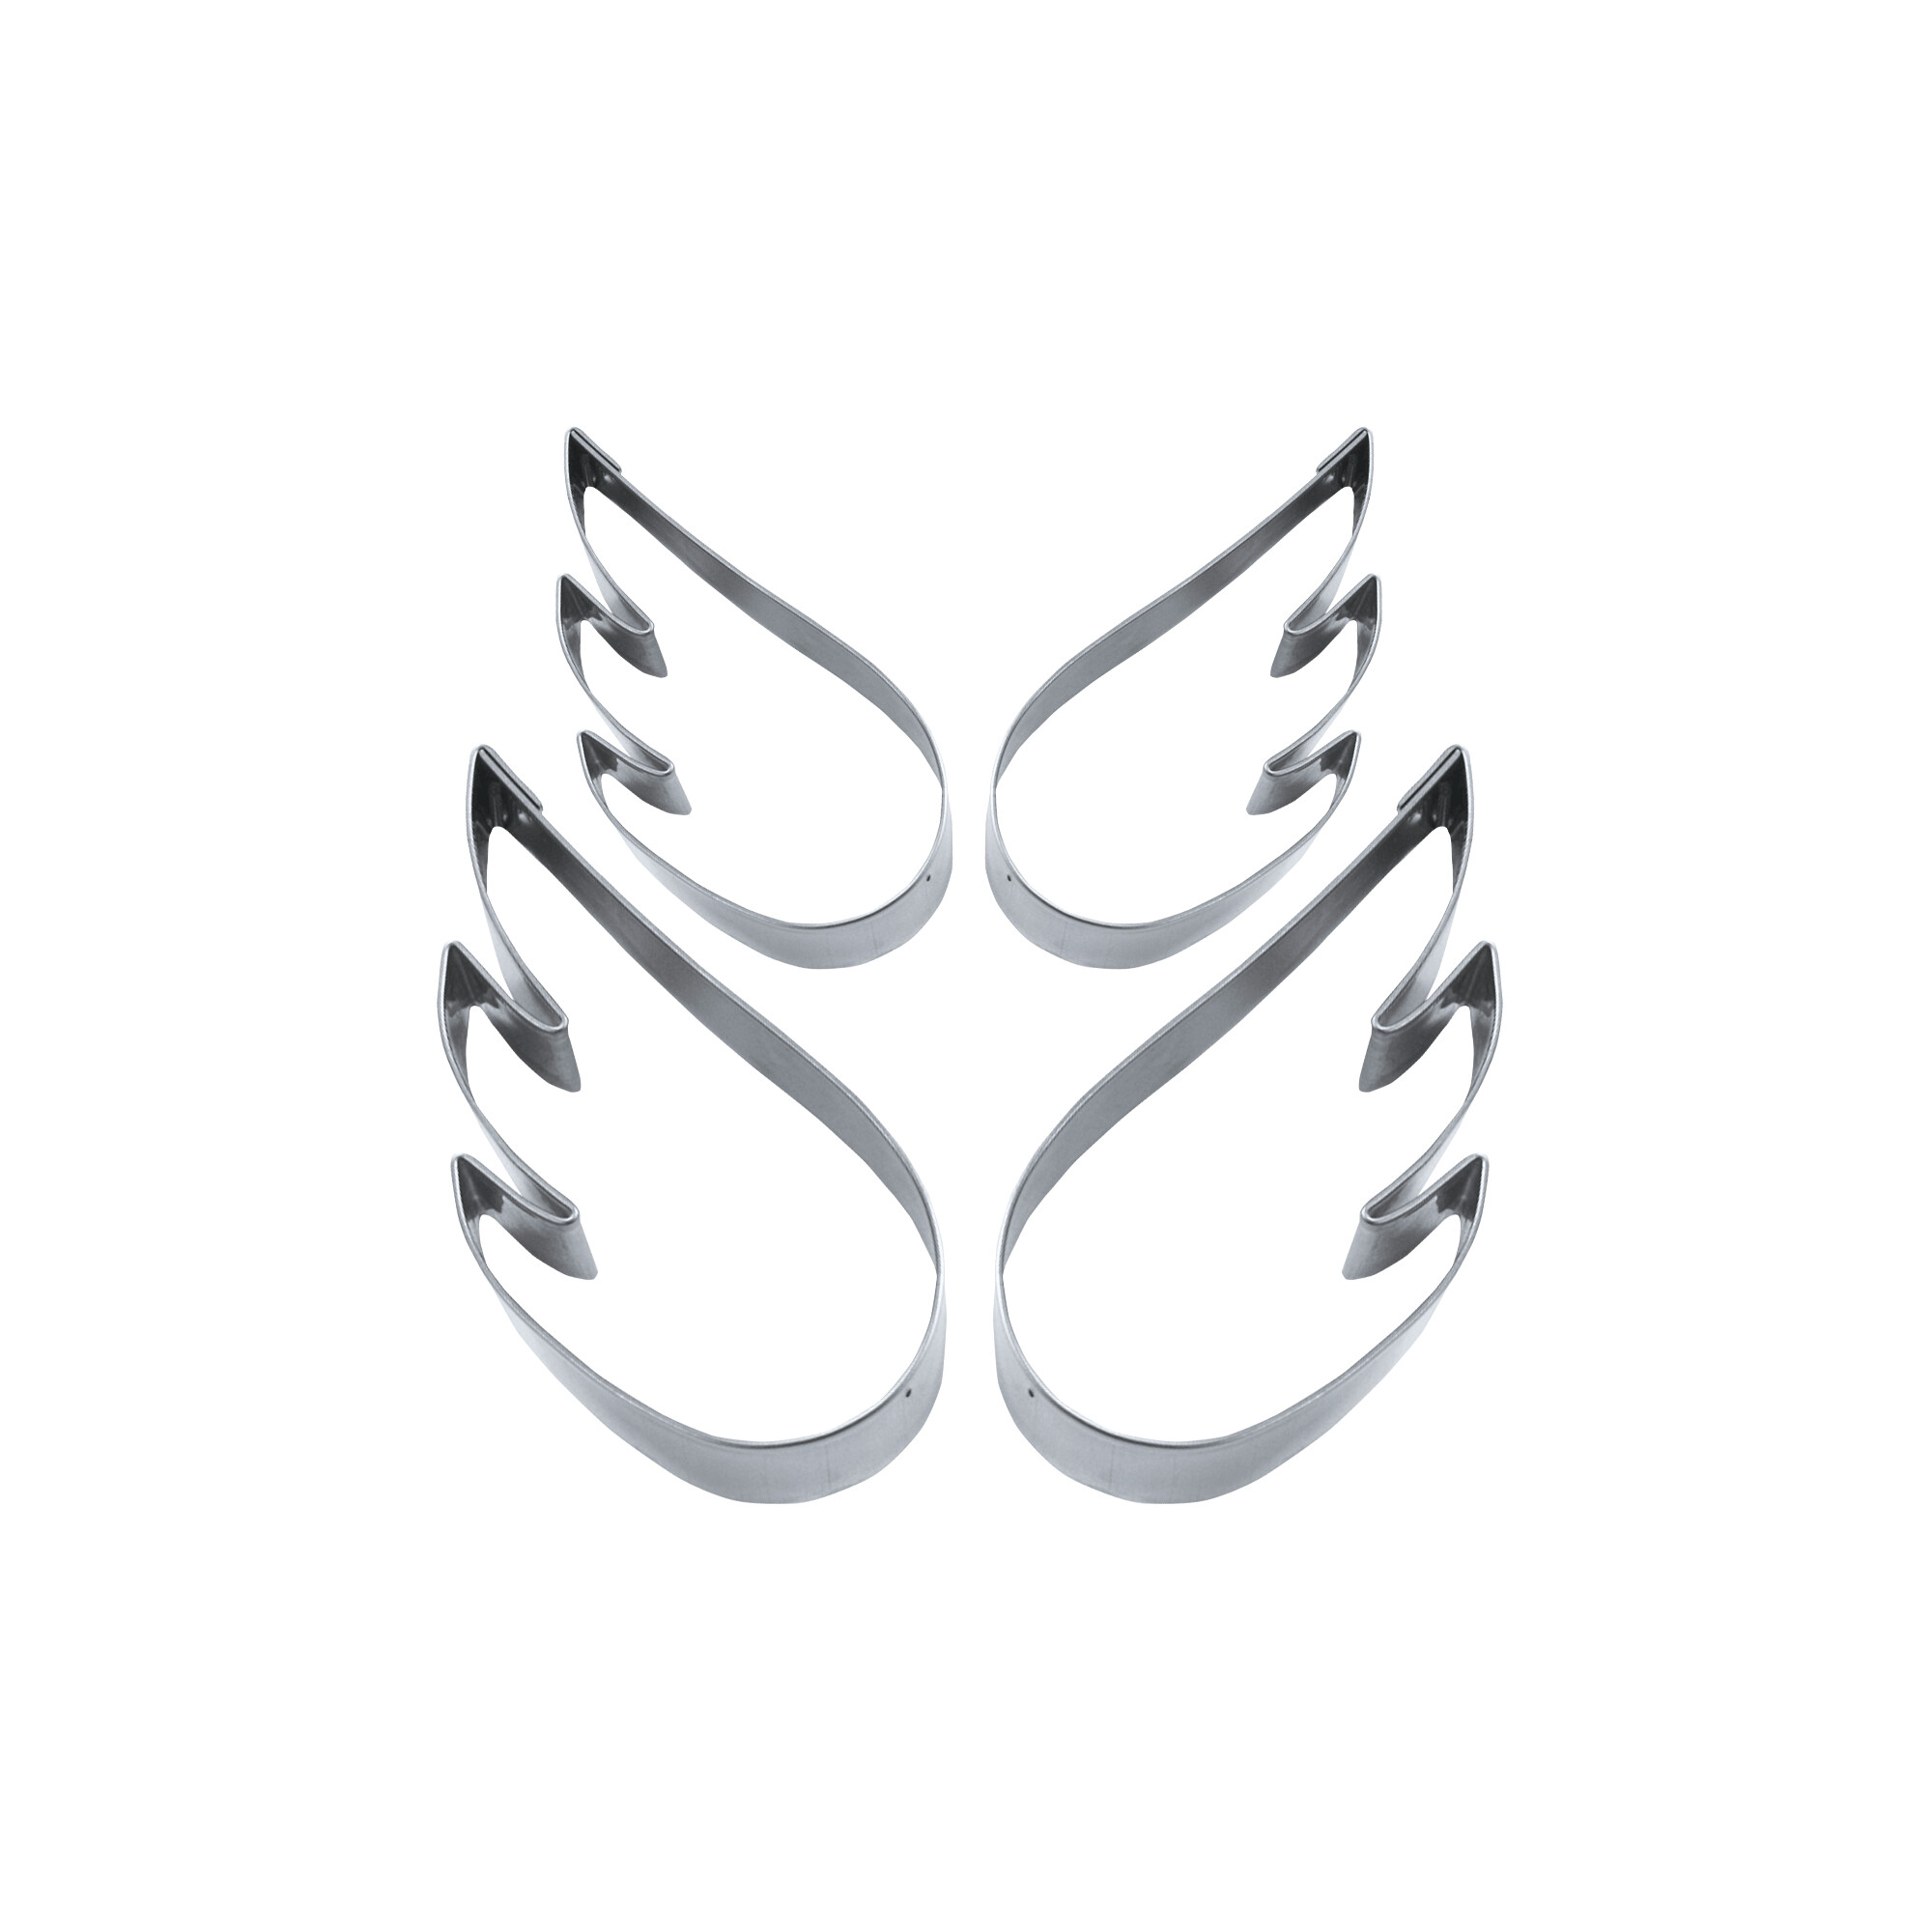 Ausstecher - Engelsflügel - Set, 4-teilig